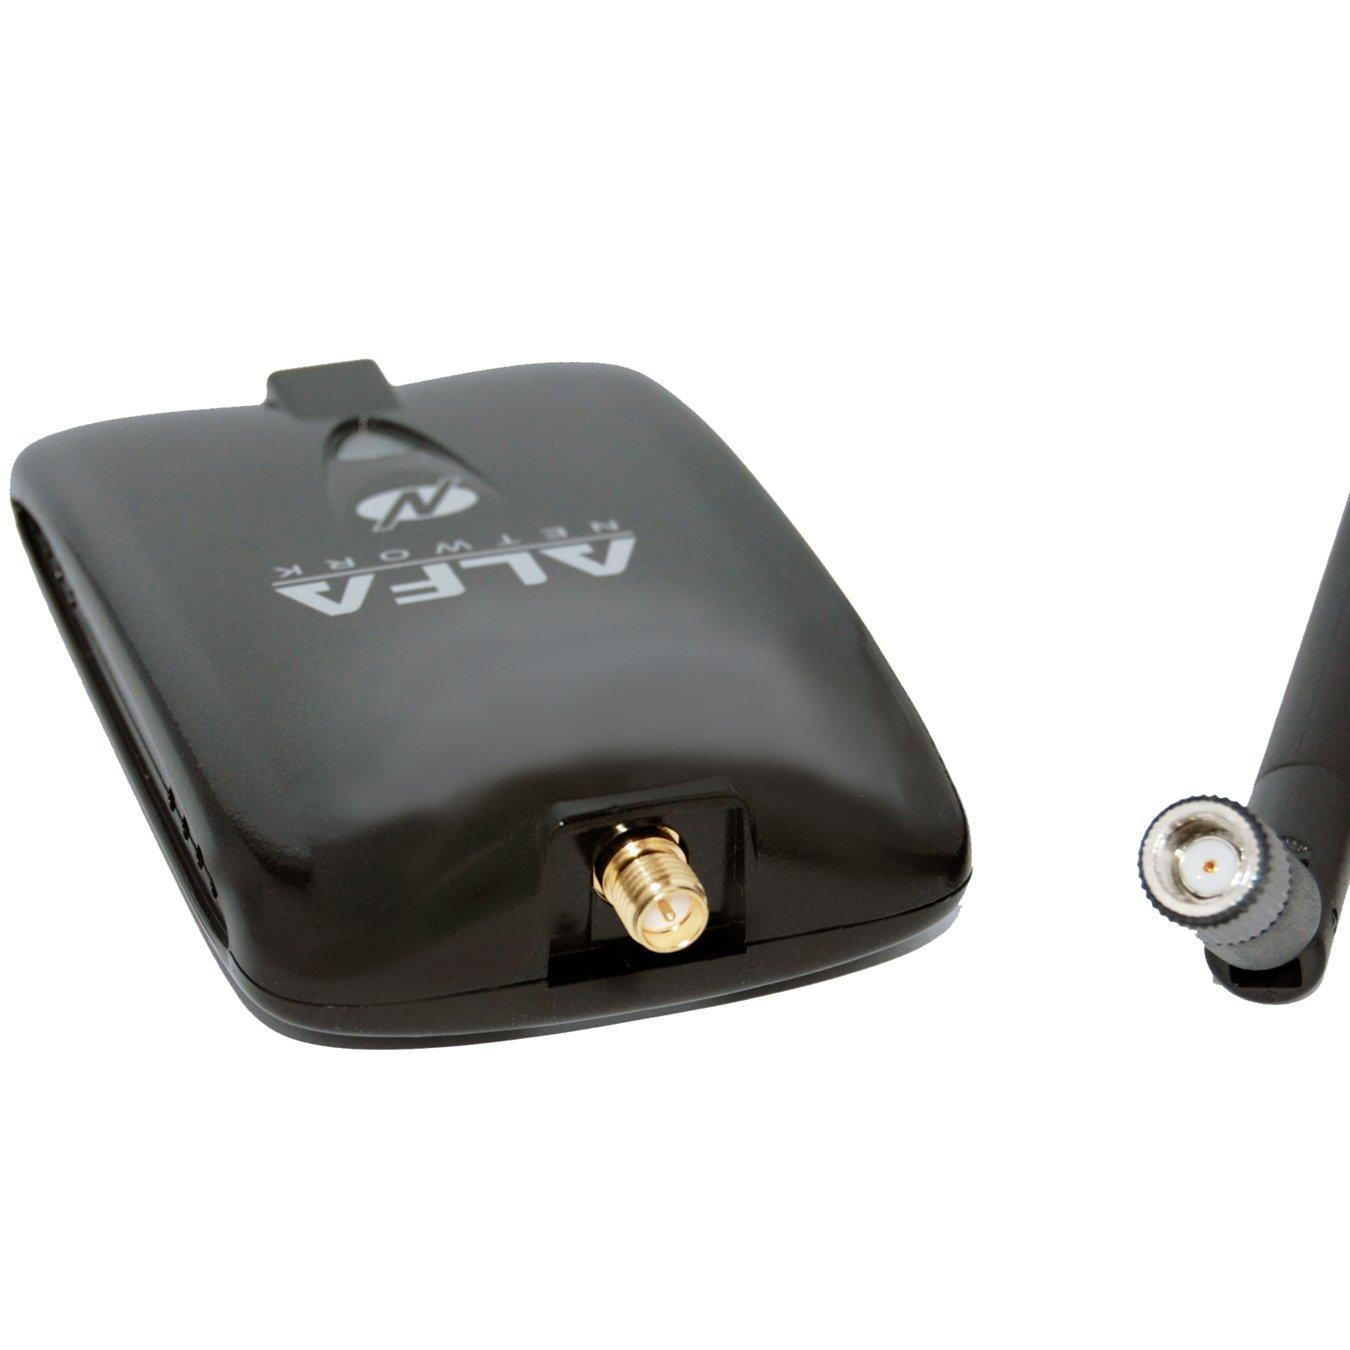 Alfa AWUS036NHA Wireless B/G/N USB Adaptor - 802.11n - 150 Mbps - 2.4 GHz - 5 dBi Antenna - Long Range - Atheros Chipset - Windows XP/Vista 64-Bit/128-Bit Windows 7 Compatible by Alfa (Image #4)